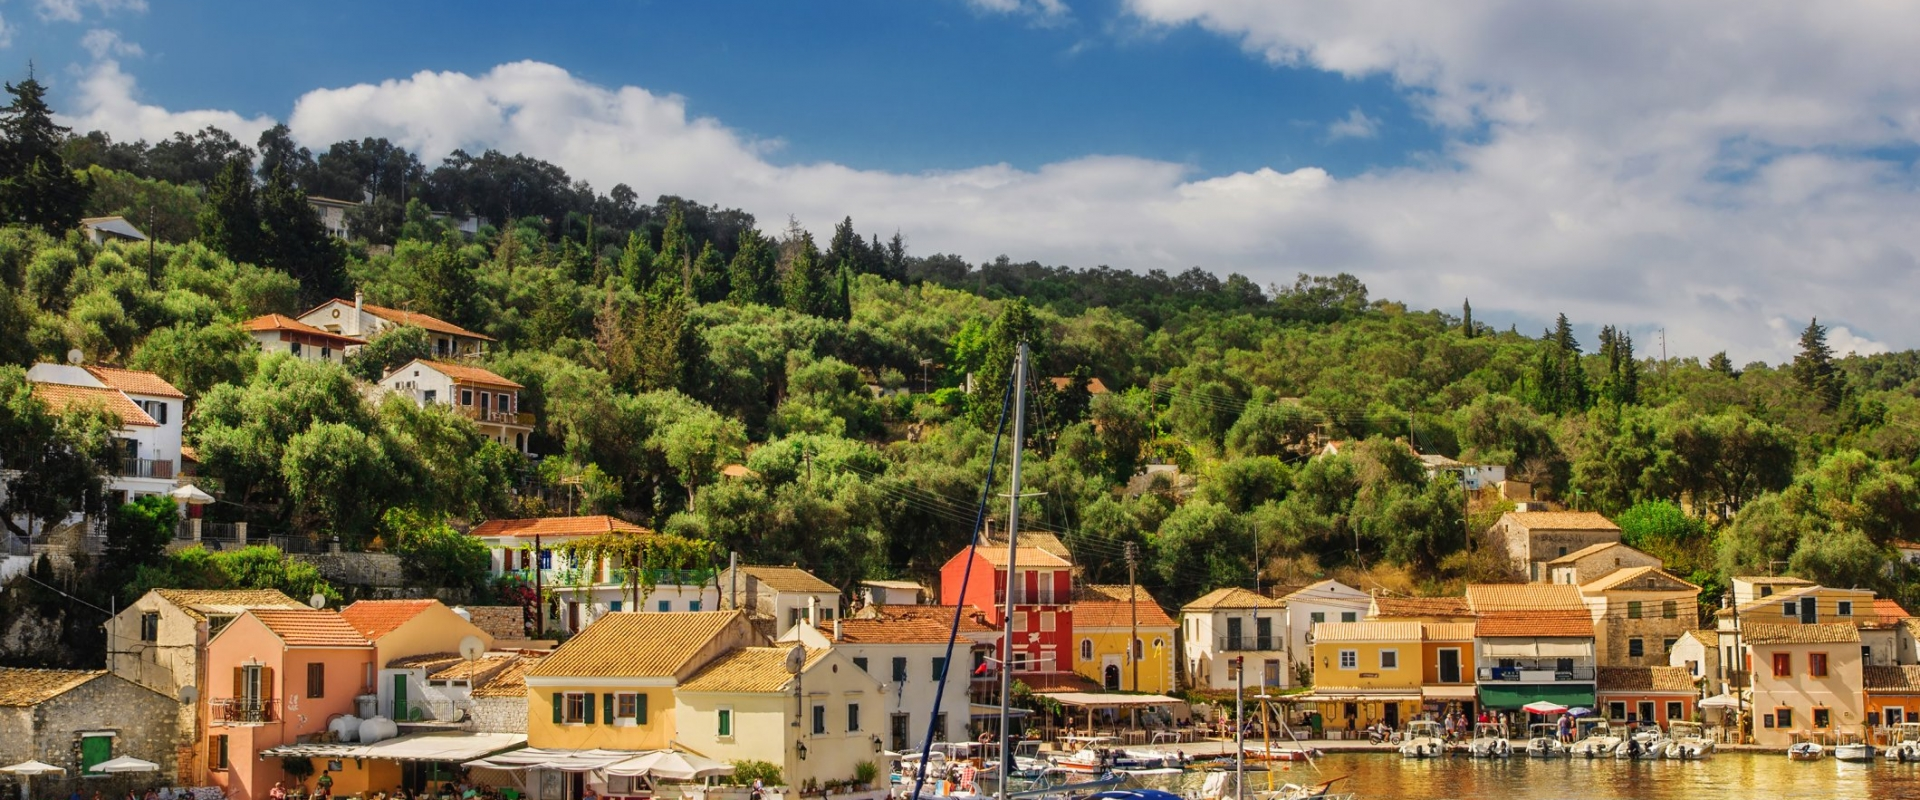 The village of Loggos, Paxos island, Greece